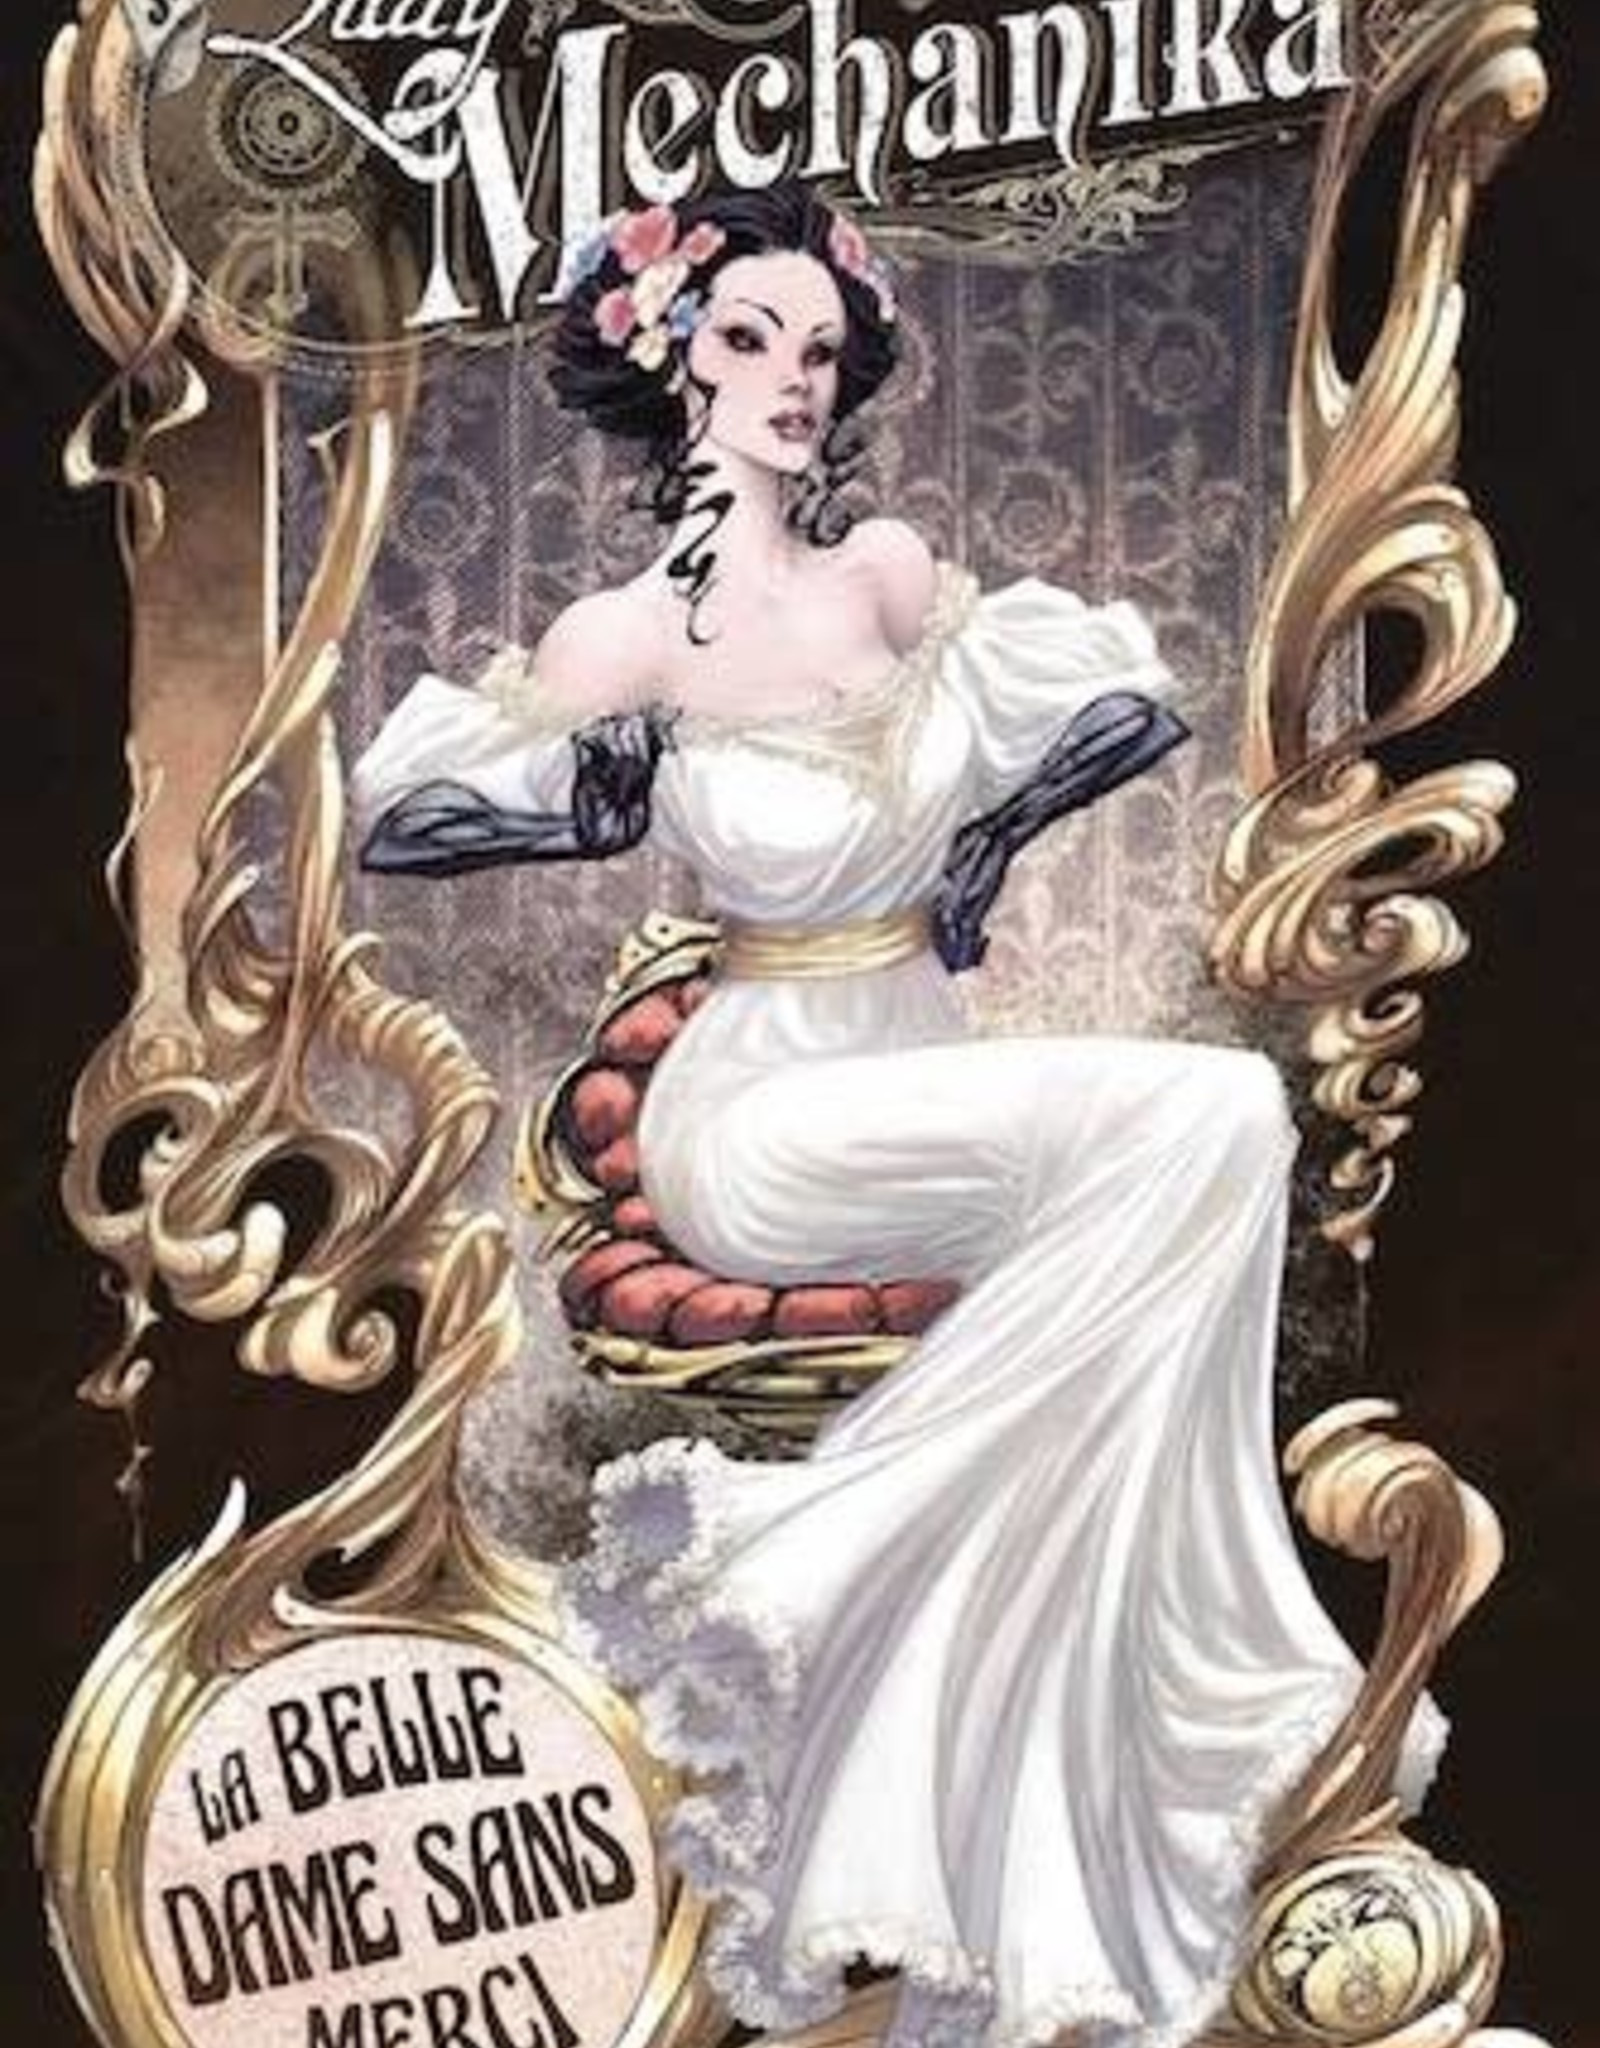 Benitez Productions Lady Mechanika TP Vol 05 La Belle Dame Sans Merci